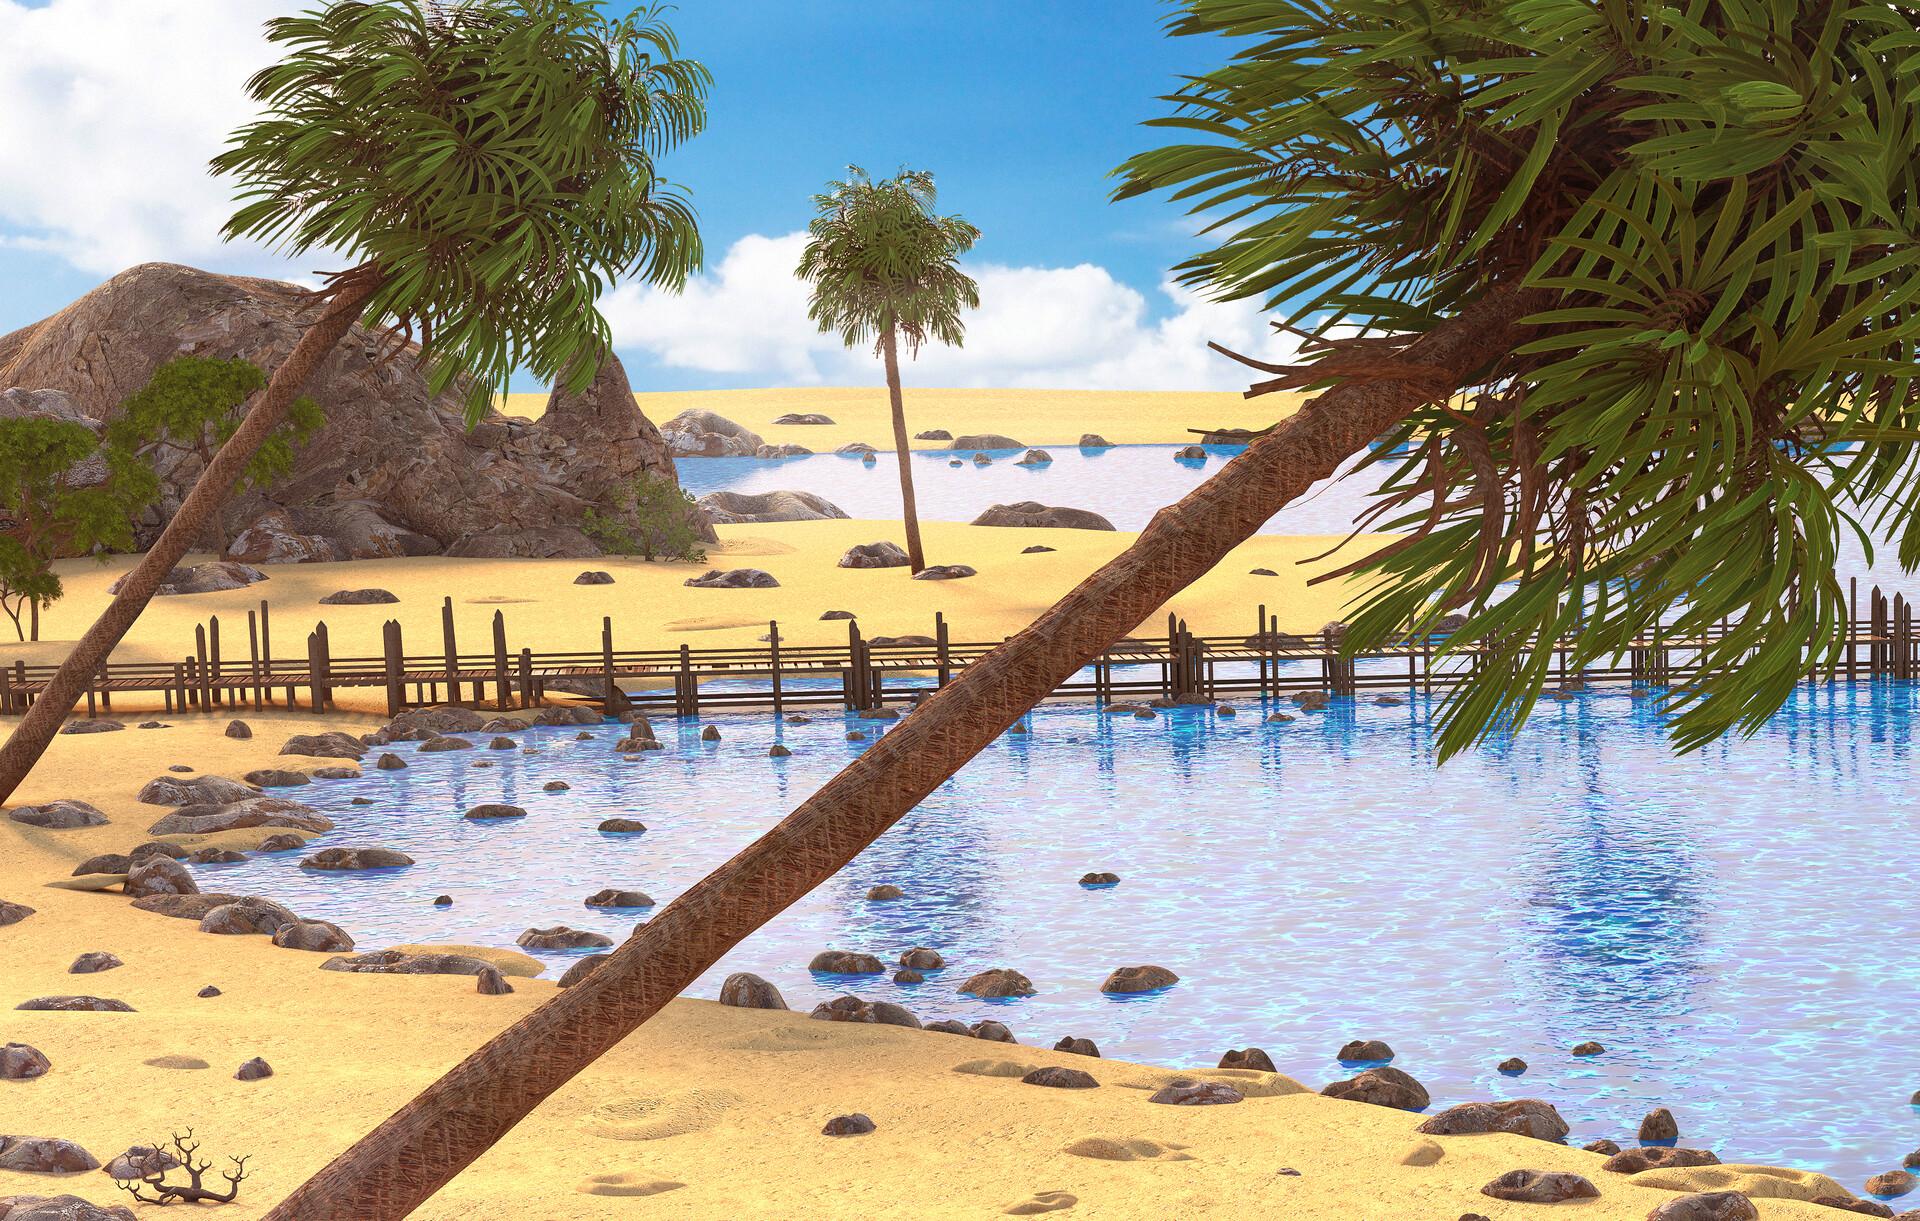 Marc mons beach5